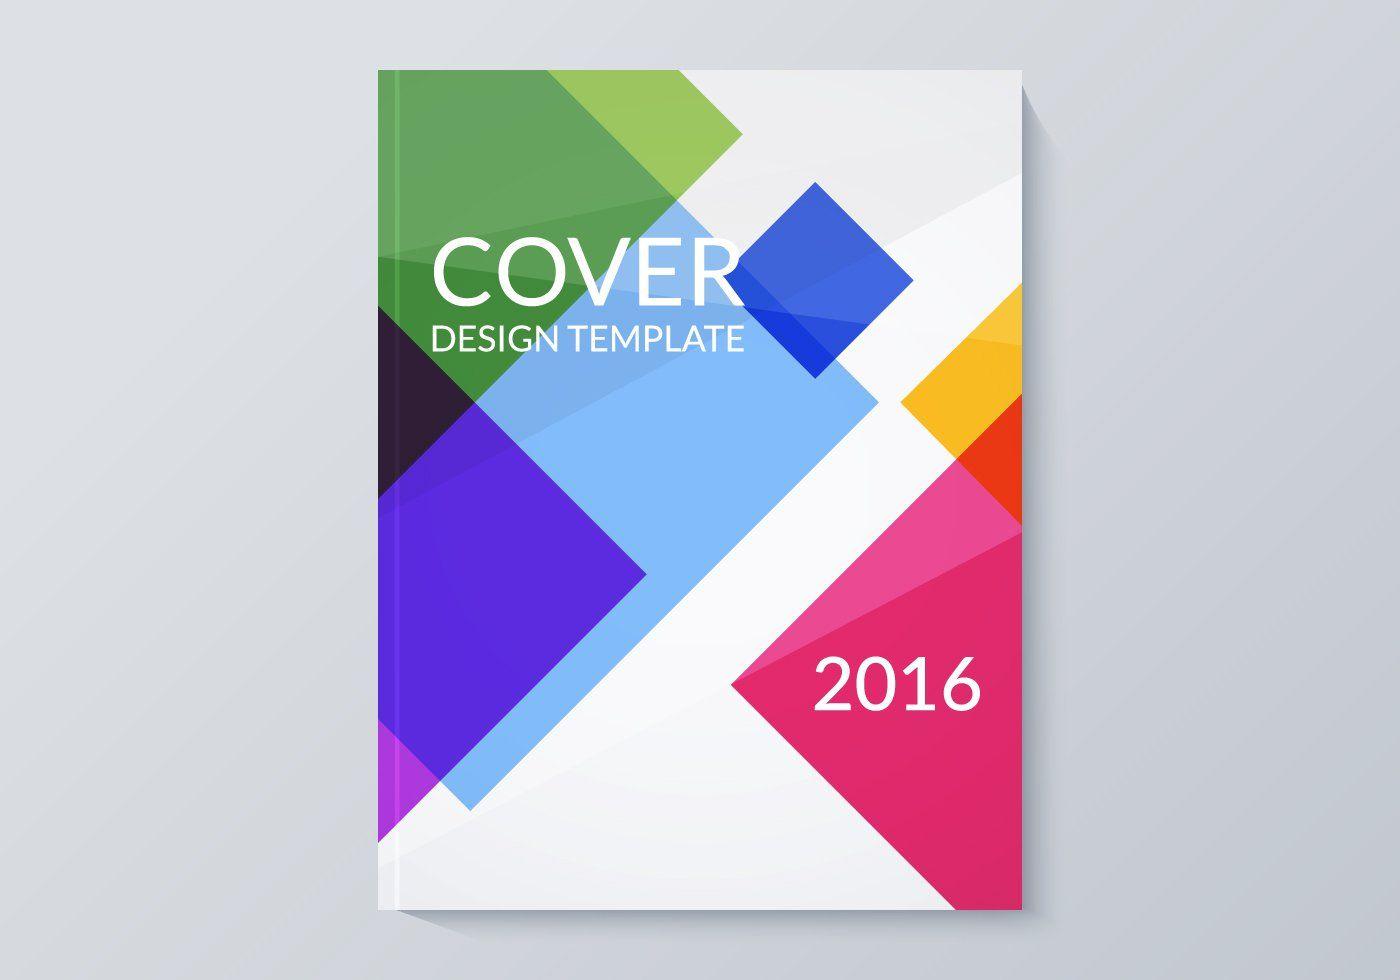 Cover Design Template Vector Graphic Professional Booklet Cover Design Book Design Layout Cover Design